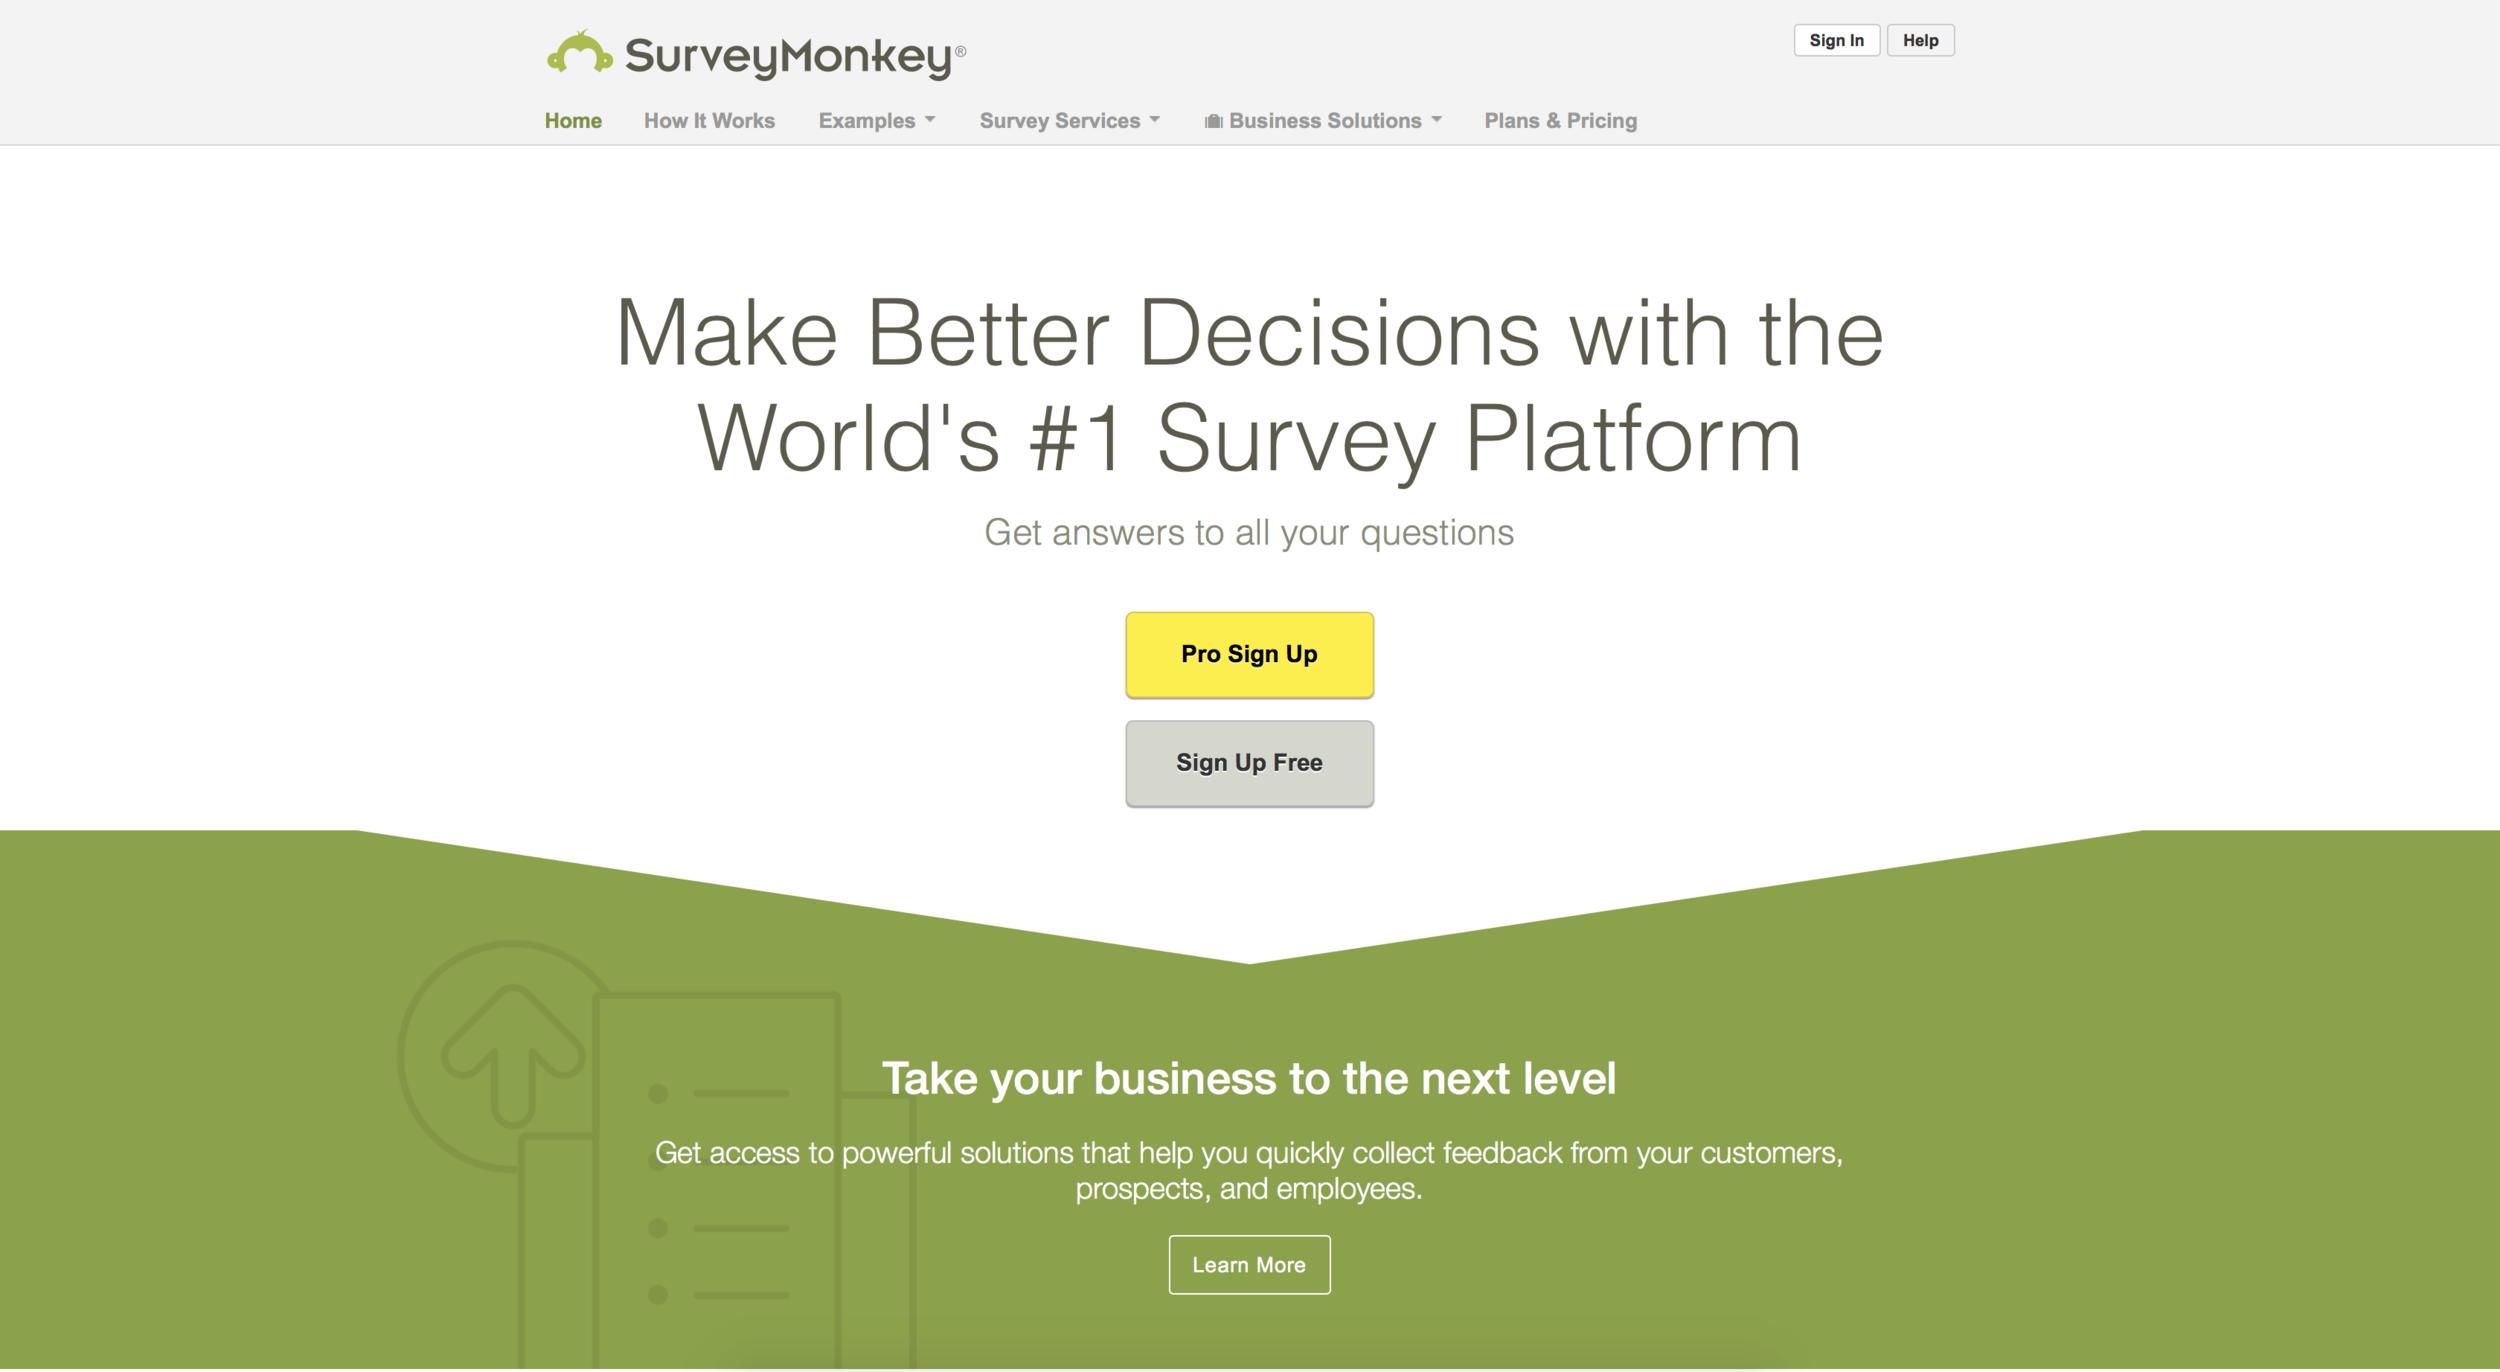 Hello-Mammoth-Blog-Small-Business-Marketing-Surveymonkey